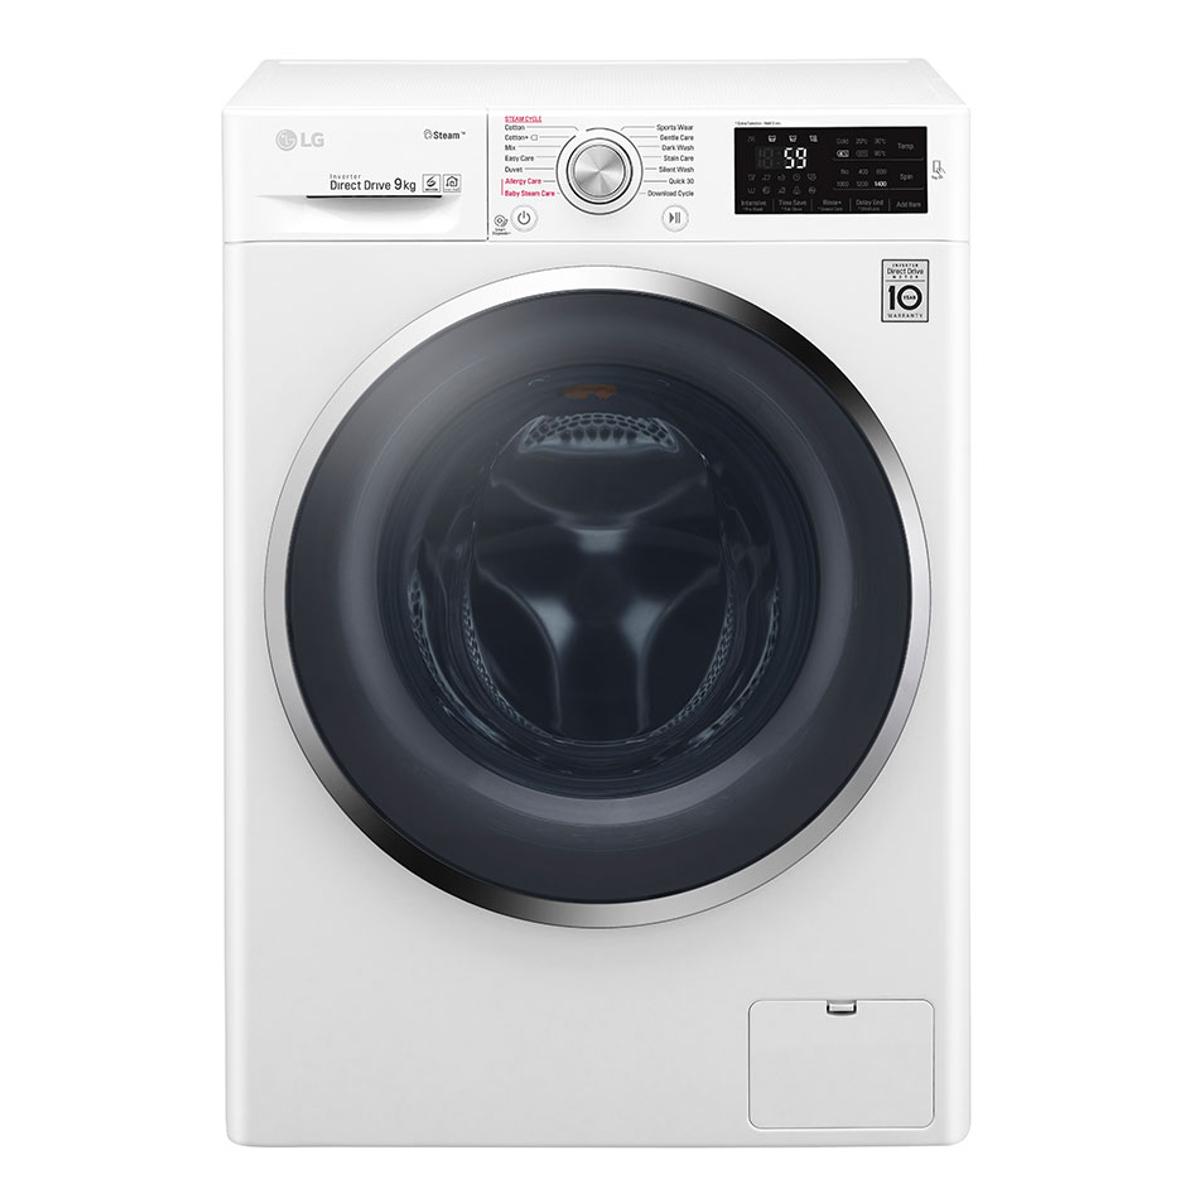 LG F4J6VY2W 9kg Washing Machine White + 5 year Guarantee